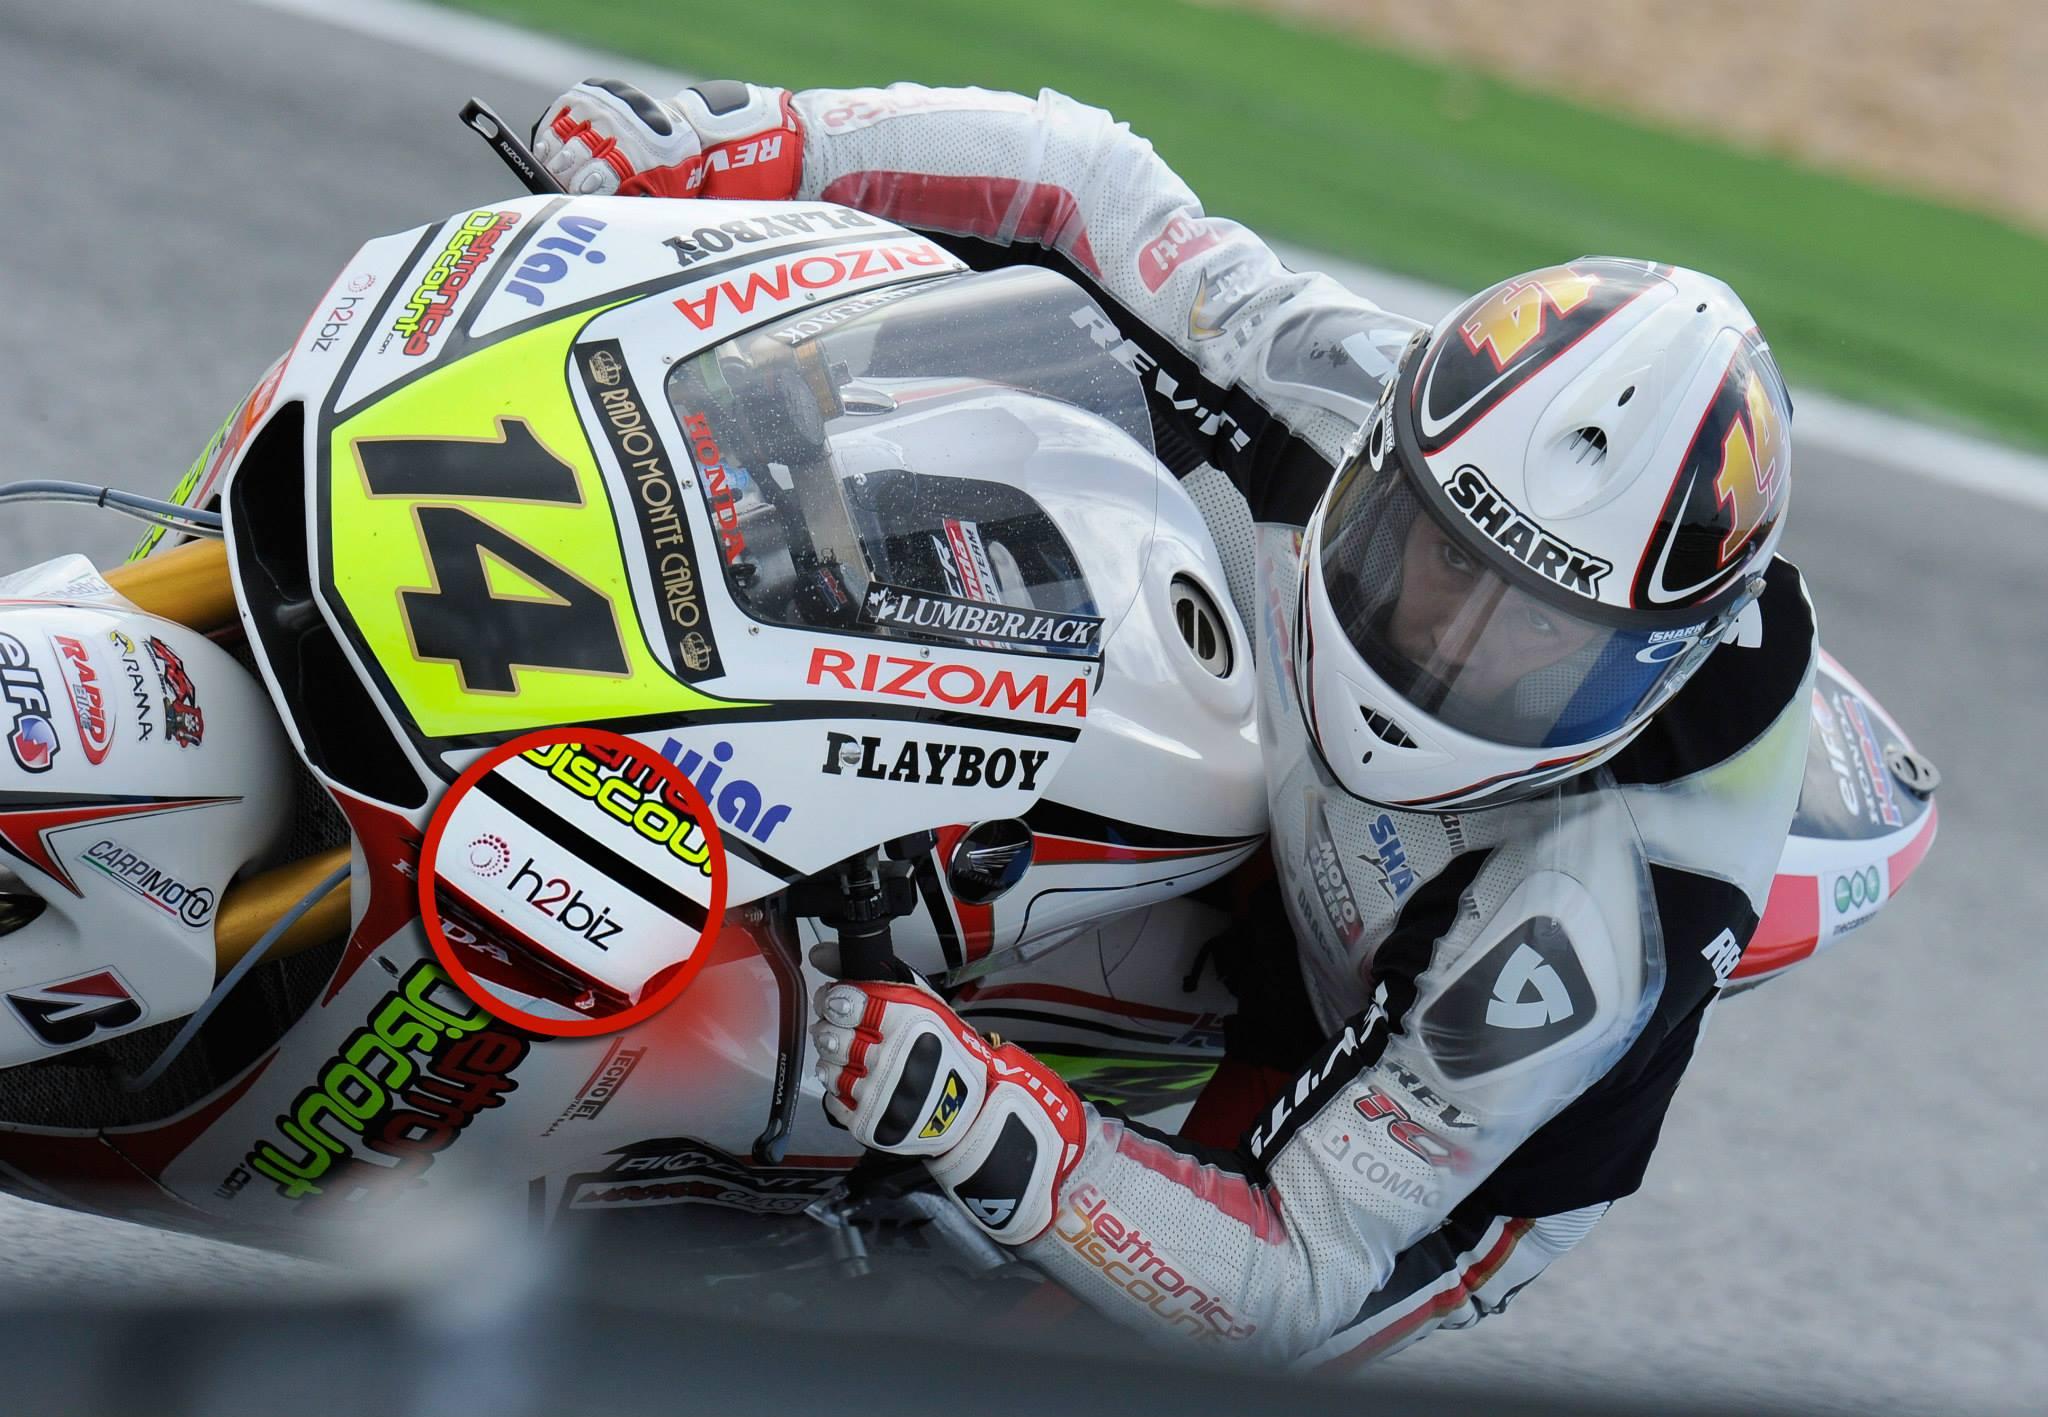 H2biz MotoGP - LCR Honda